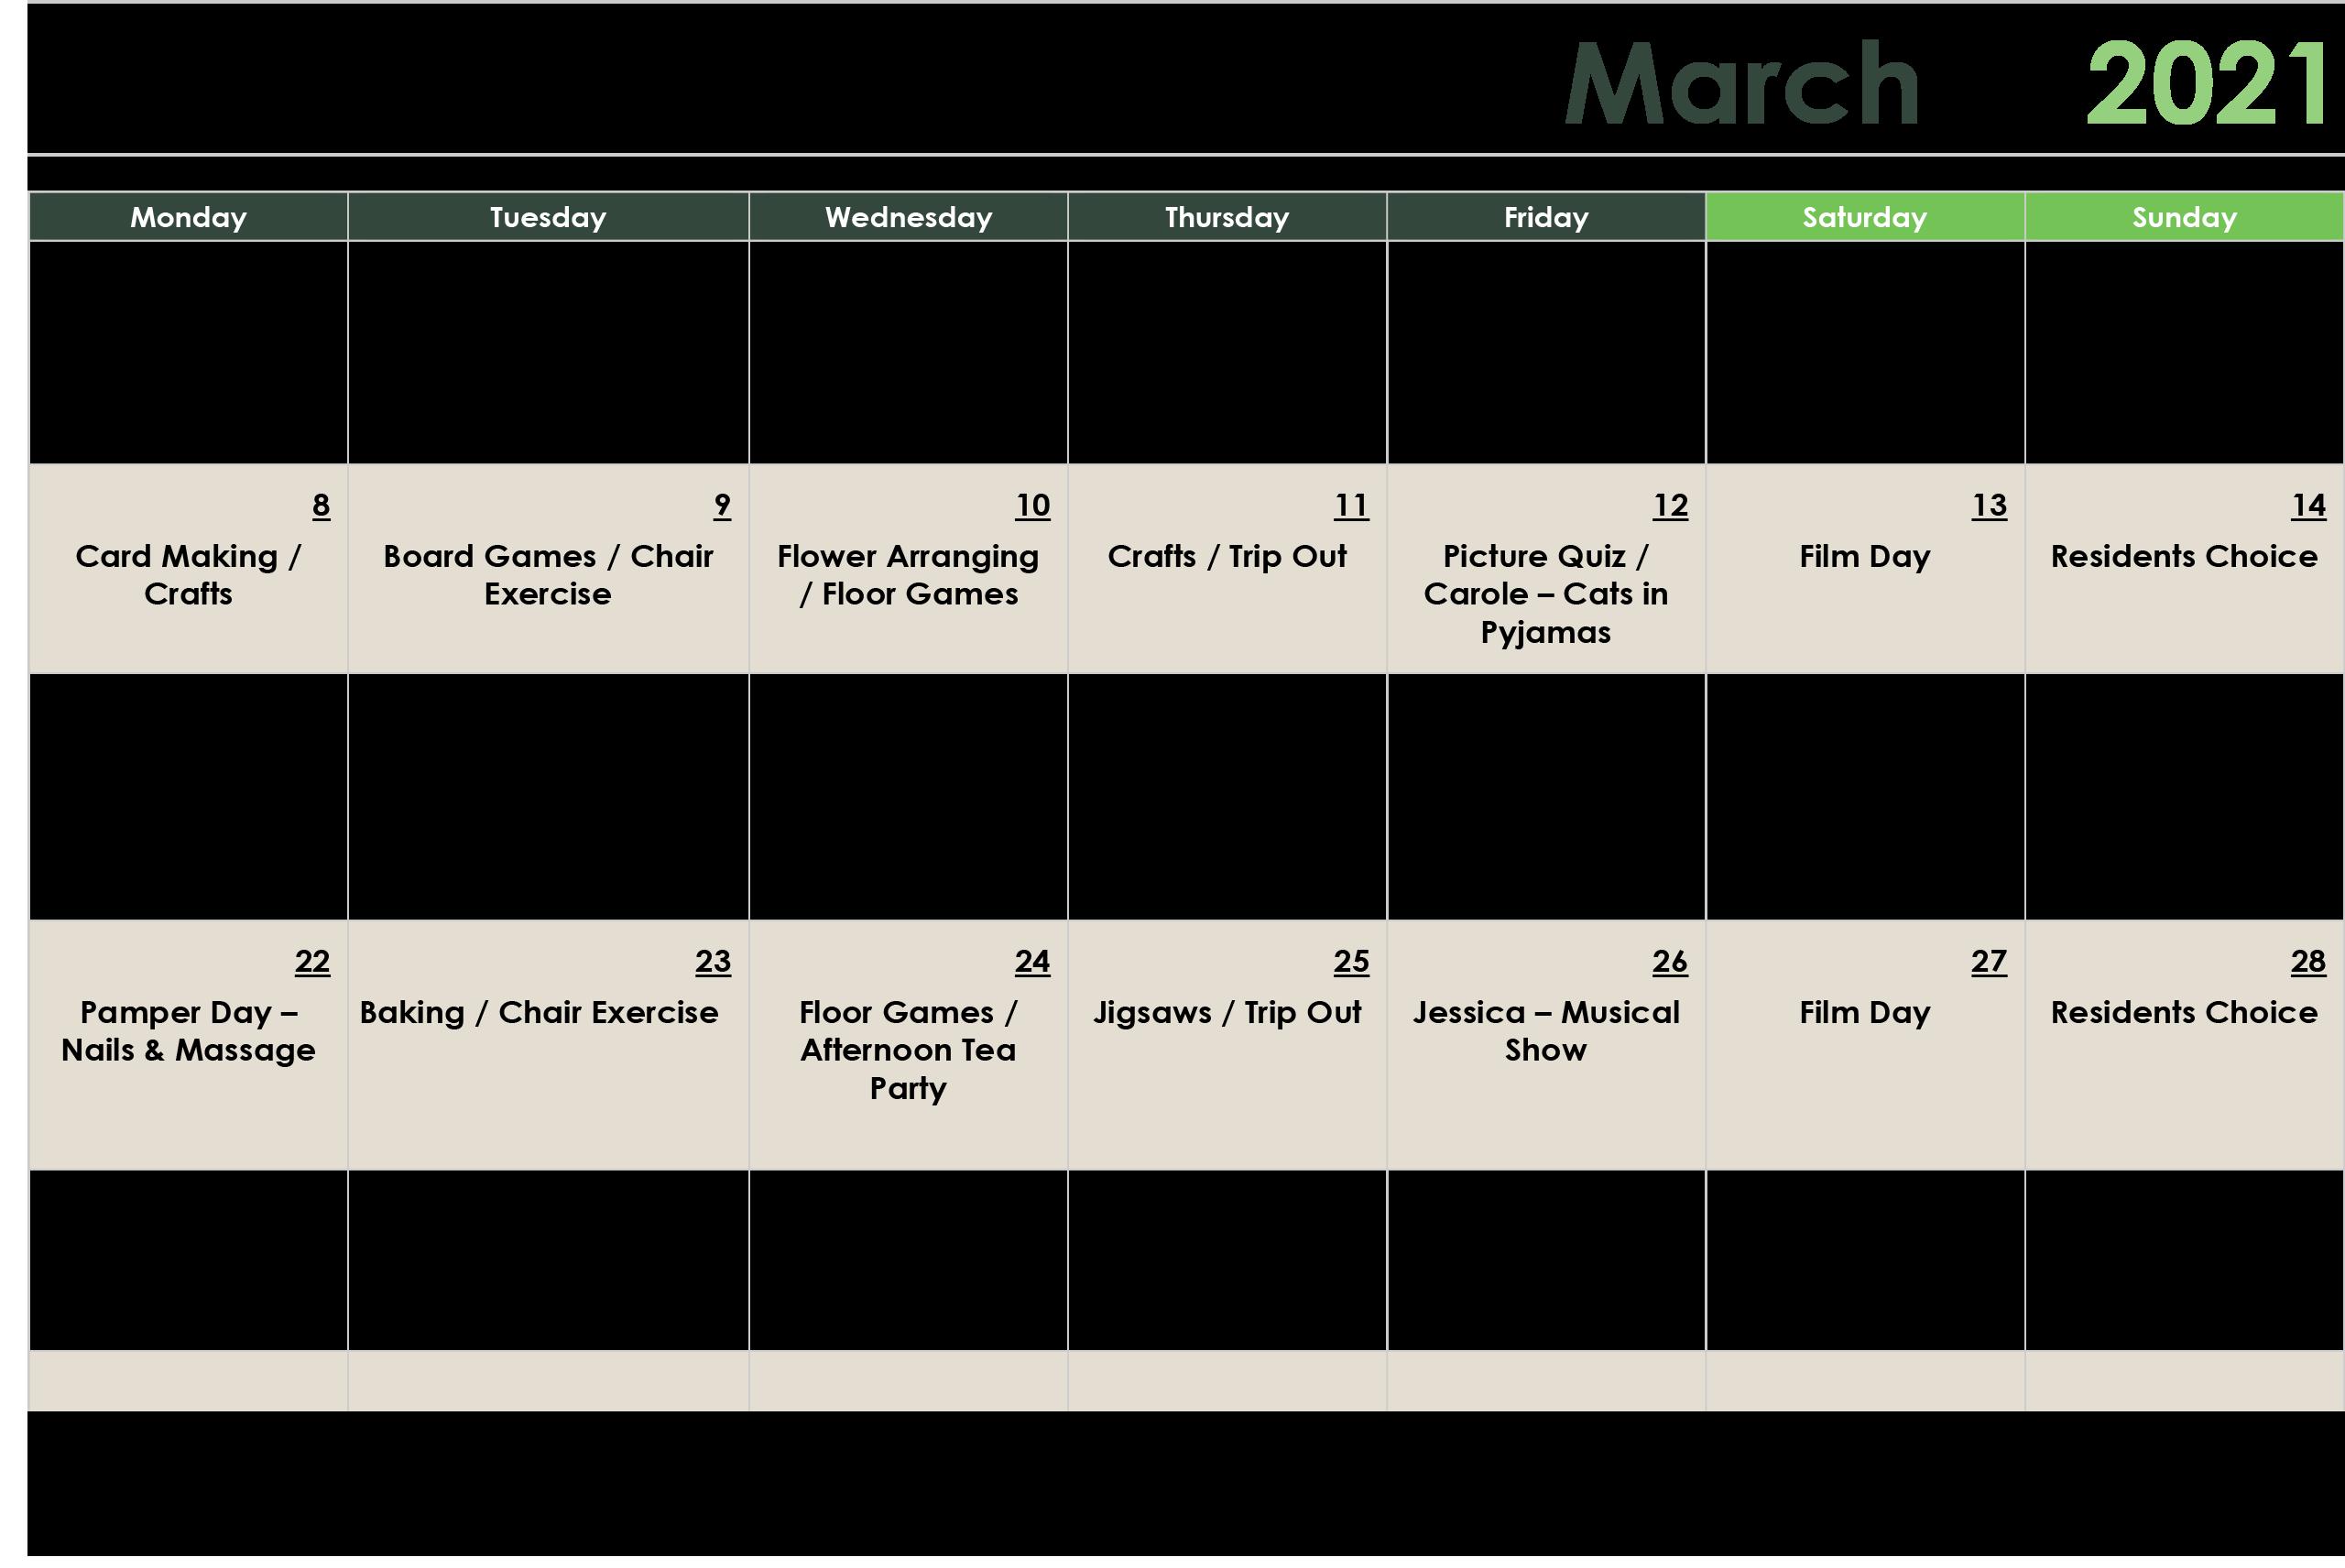 March Activity Calendar 2021